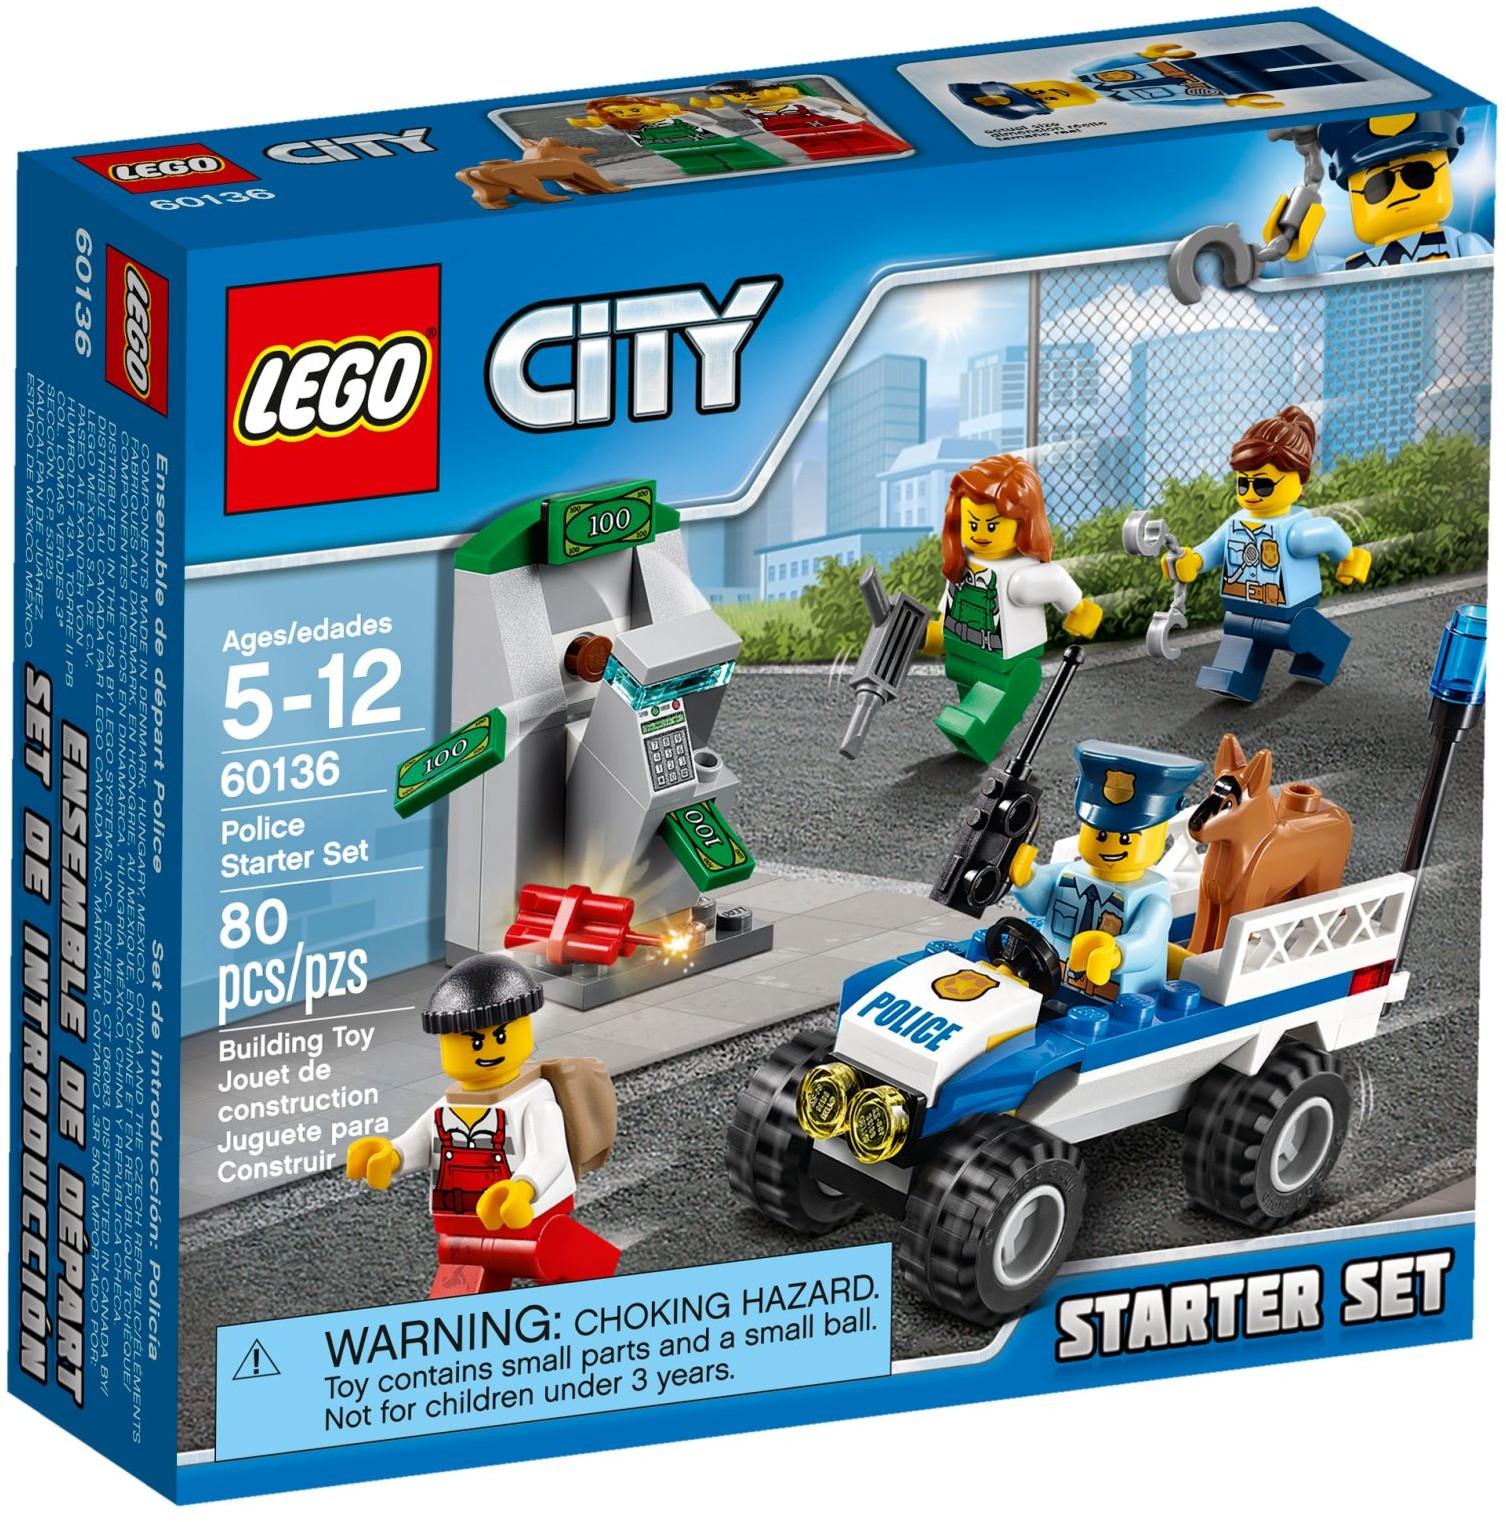 Mua đồ chơi LEGO 60136 - LEGO City 60136 - Biệt Đội Cảnh Sát bắt Cướp (LEGO City Police Starter Set 60136)